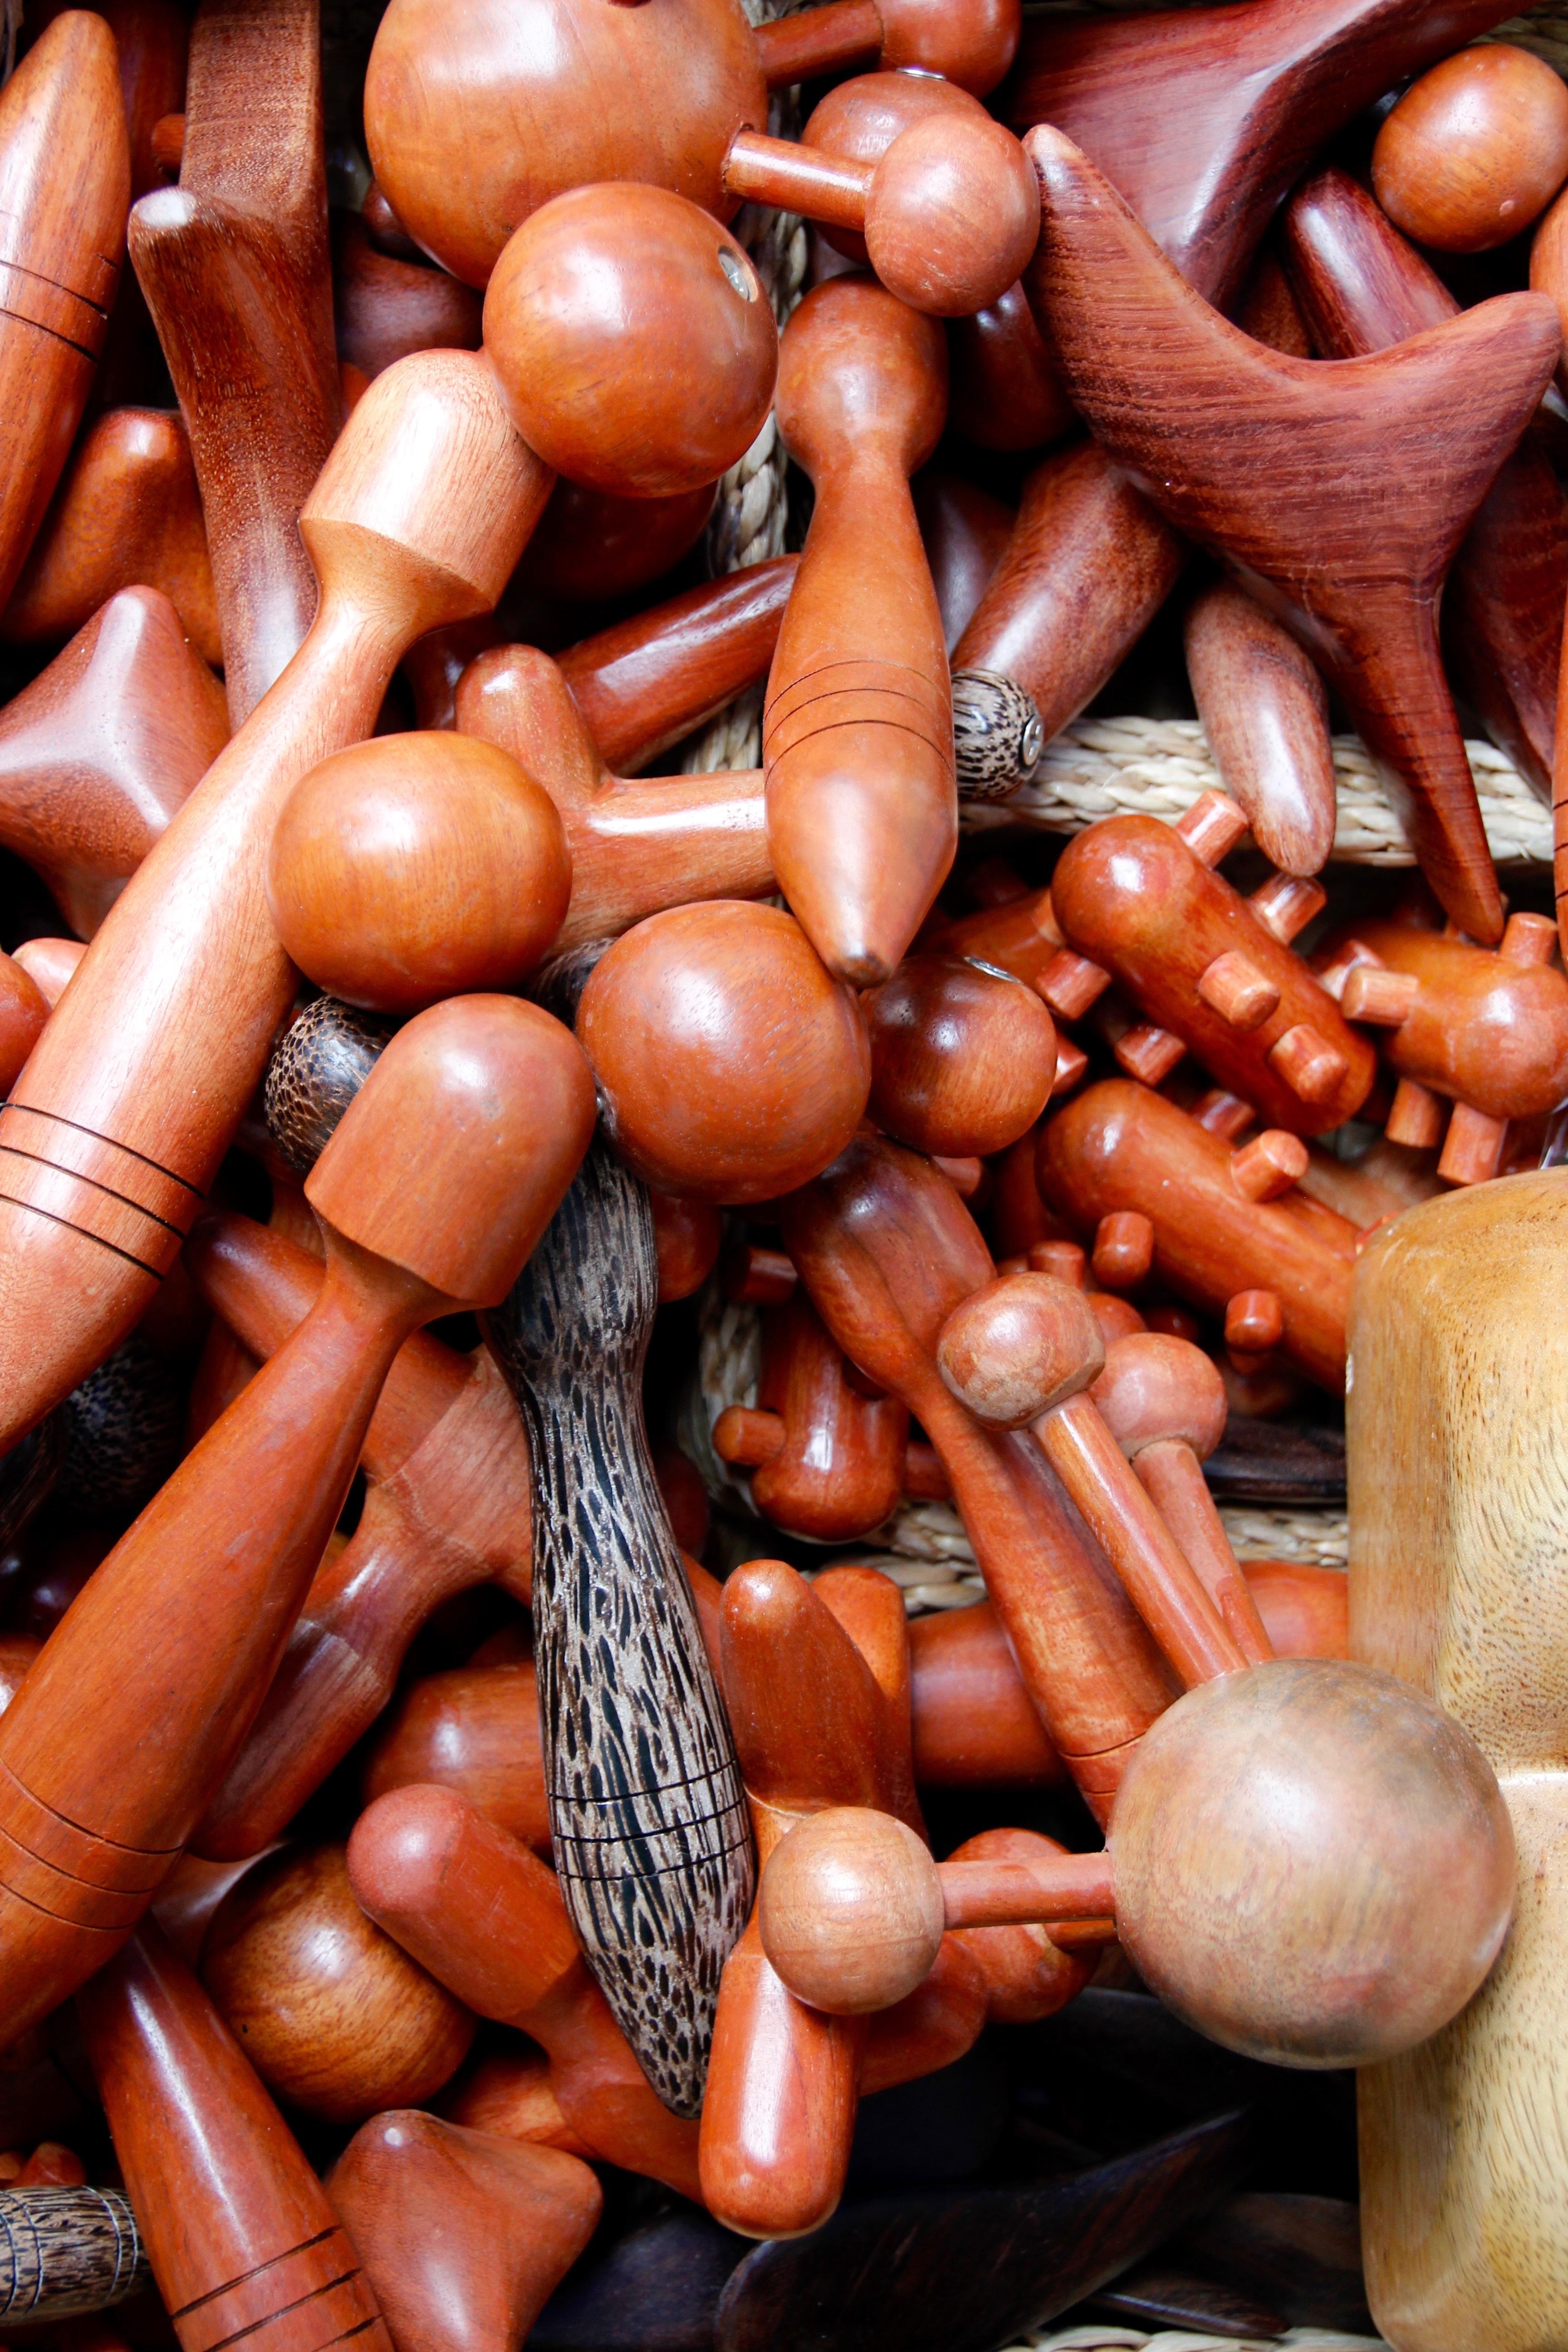 Массаж бесплатно игрушки фото 197-836